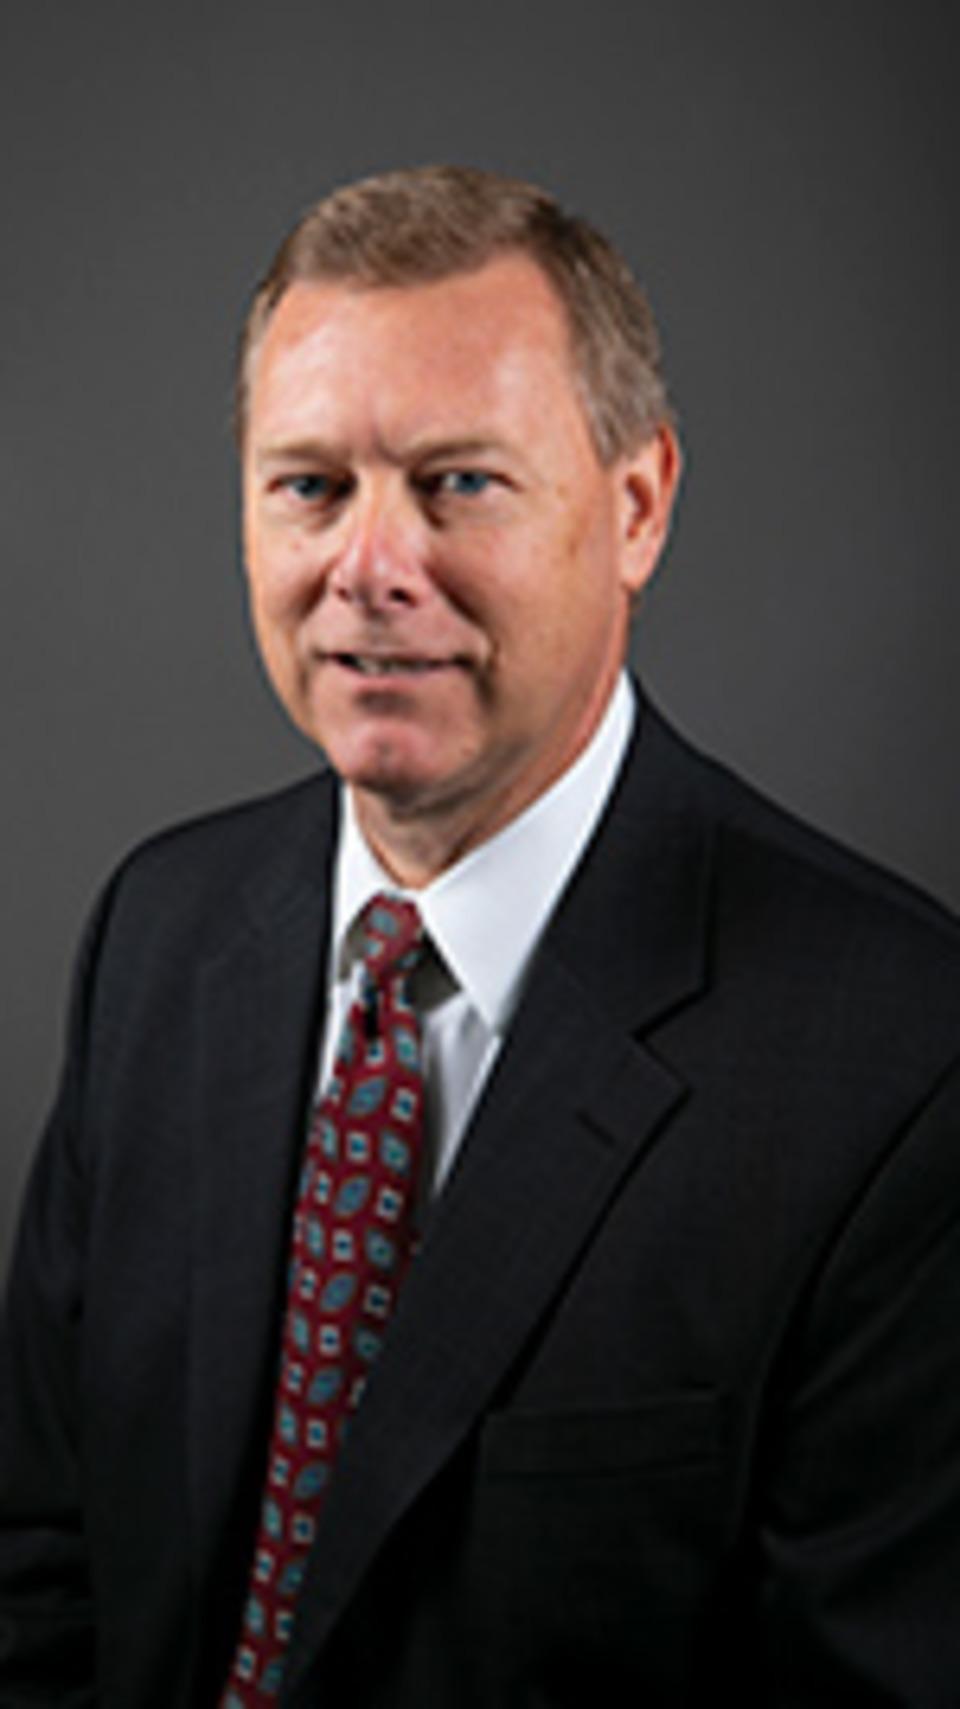 Dallas Area Rapid Transit Names New Vp Of Internal Audit